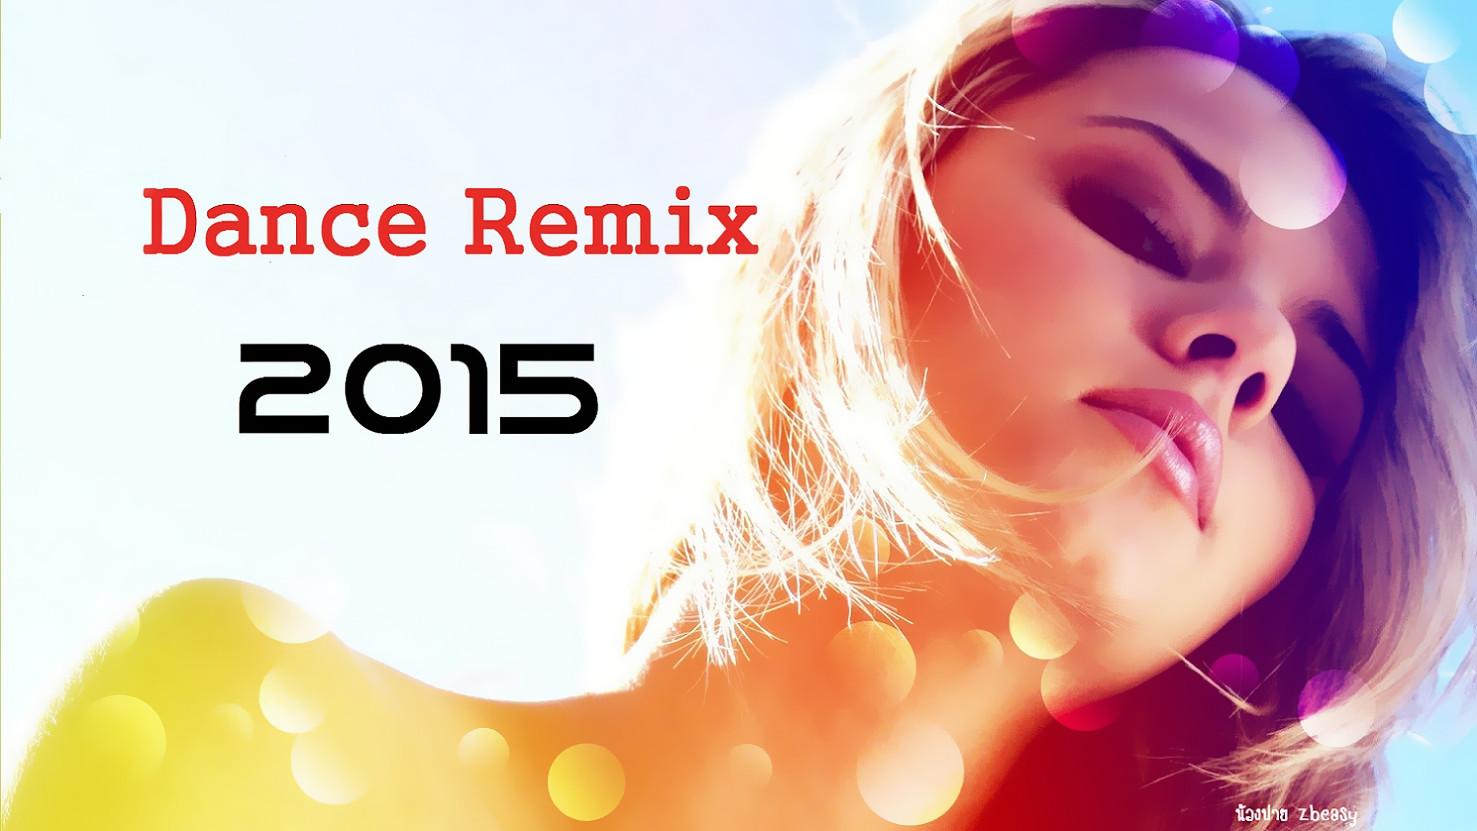 Download [Mp3]-[Hit Music] เพลงแดนซ์สุดฮิตจากหลากหลายงานเพลง ในชุด 50 Dance Remixed Hits 2015 4shared By Pleng-mun.com